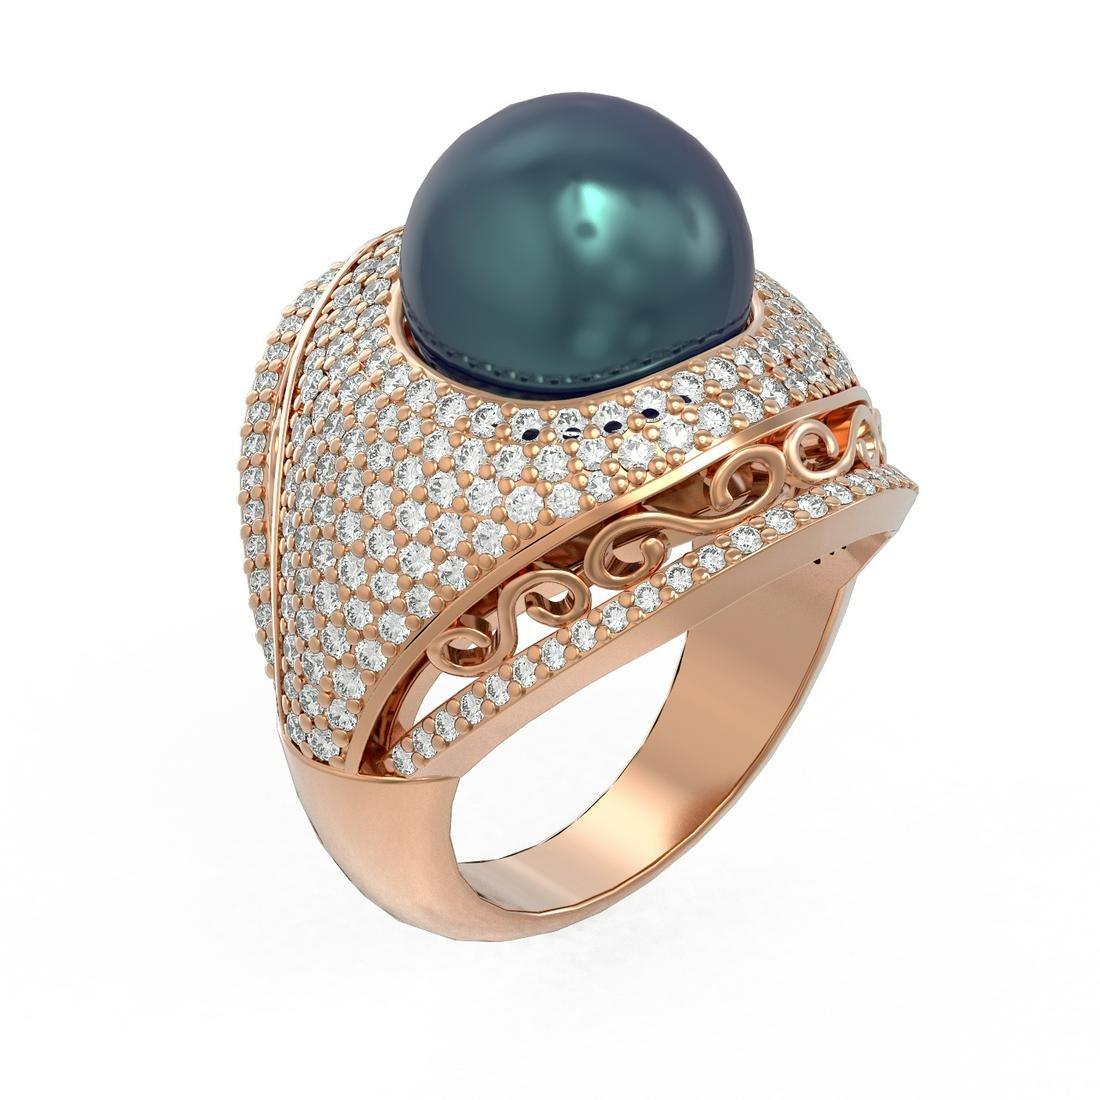 2.5 ctw Diamond & Pearl Ring 18K Rose Gold - REF-270A4N